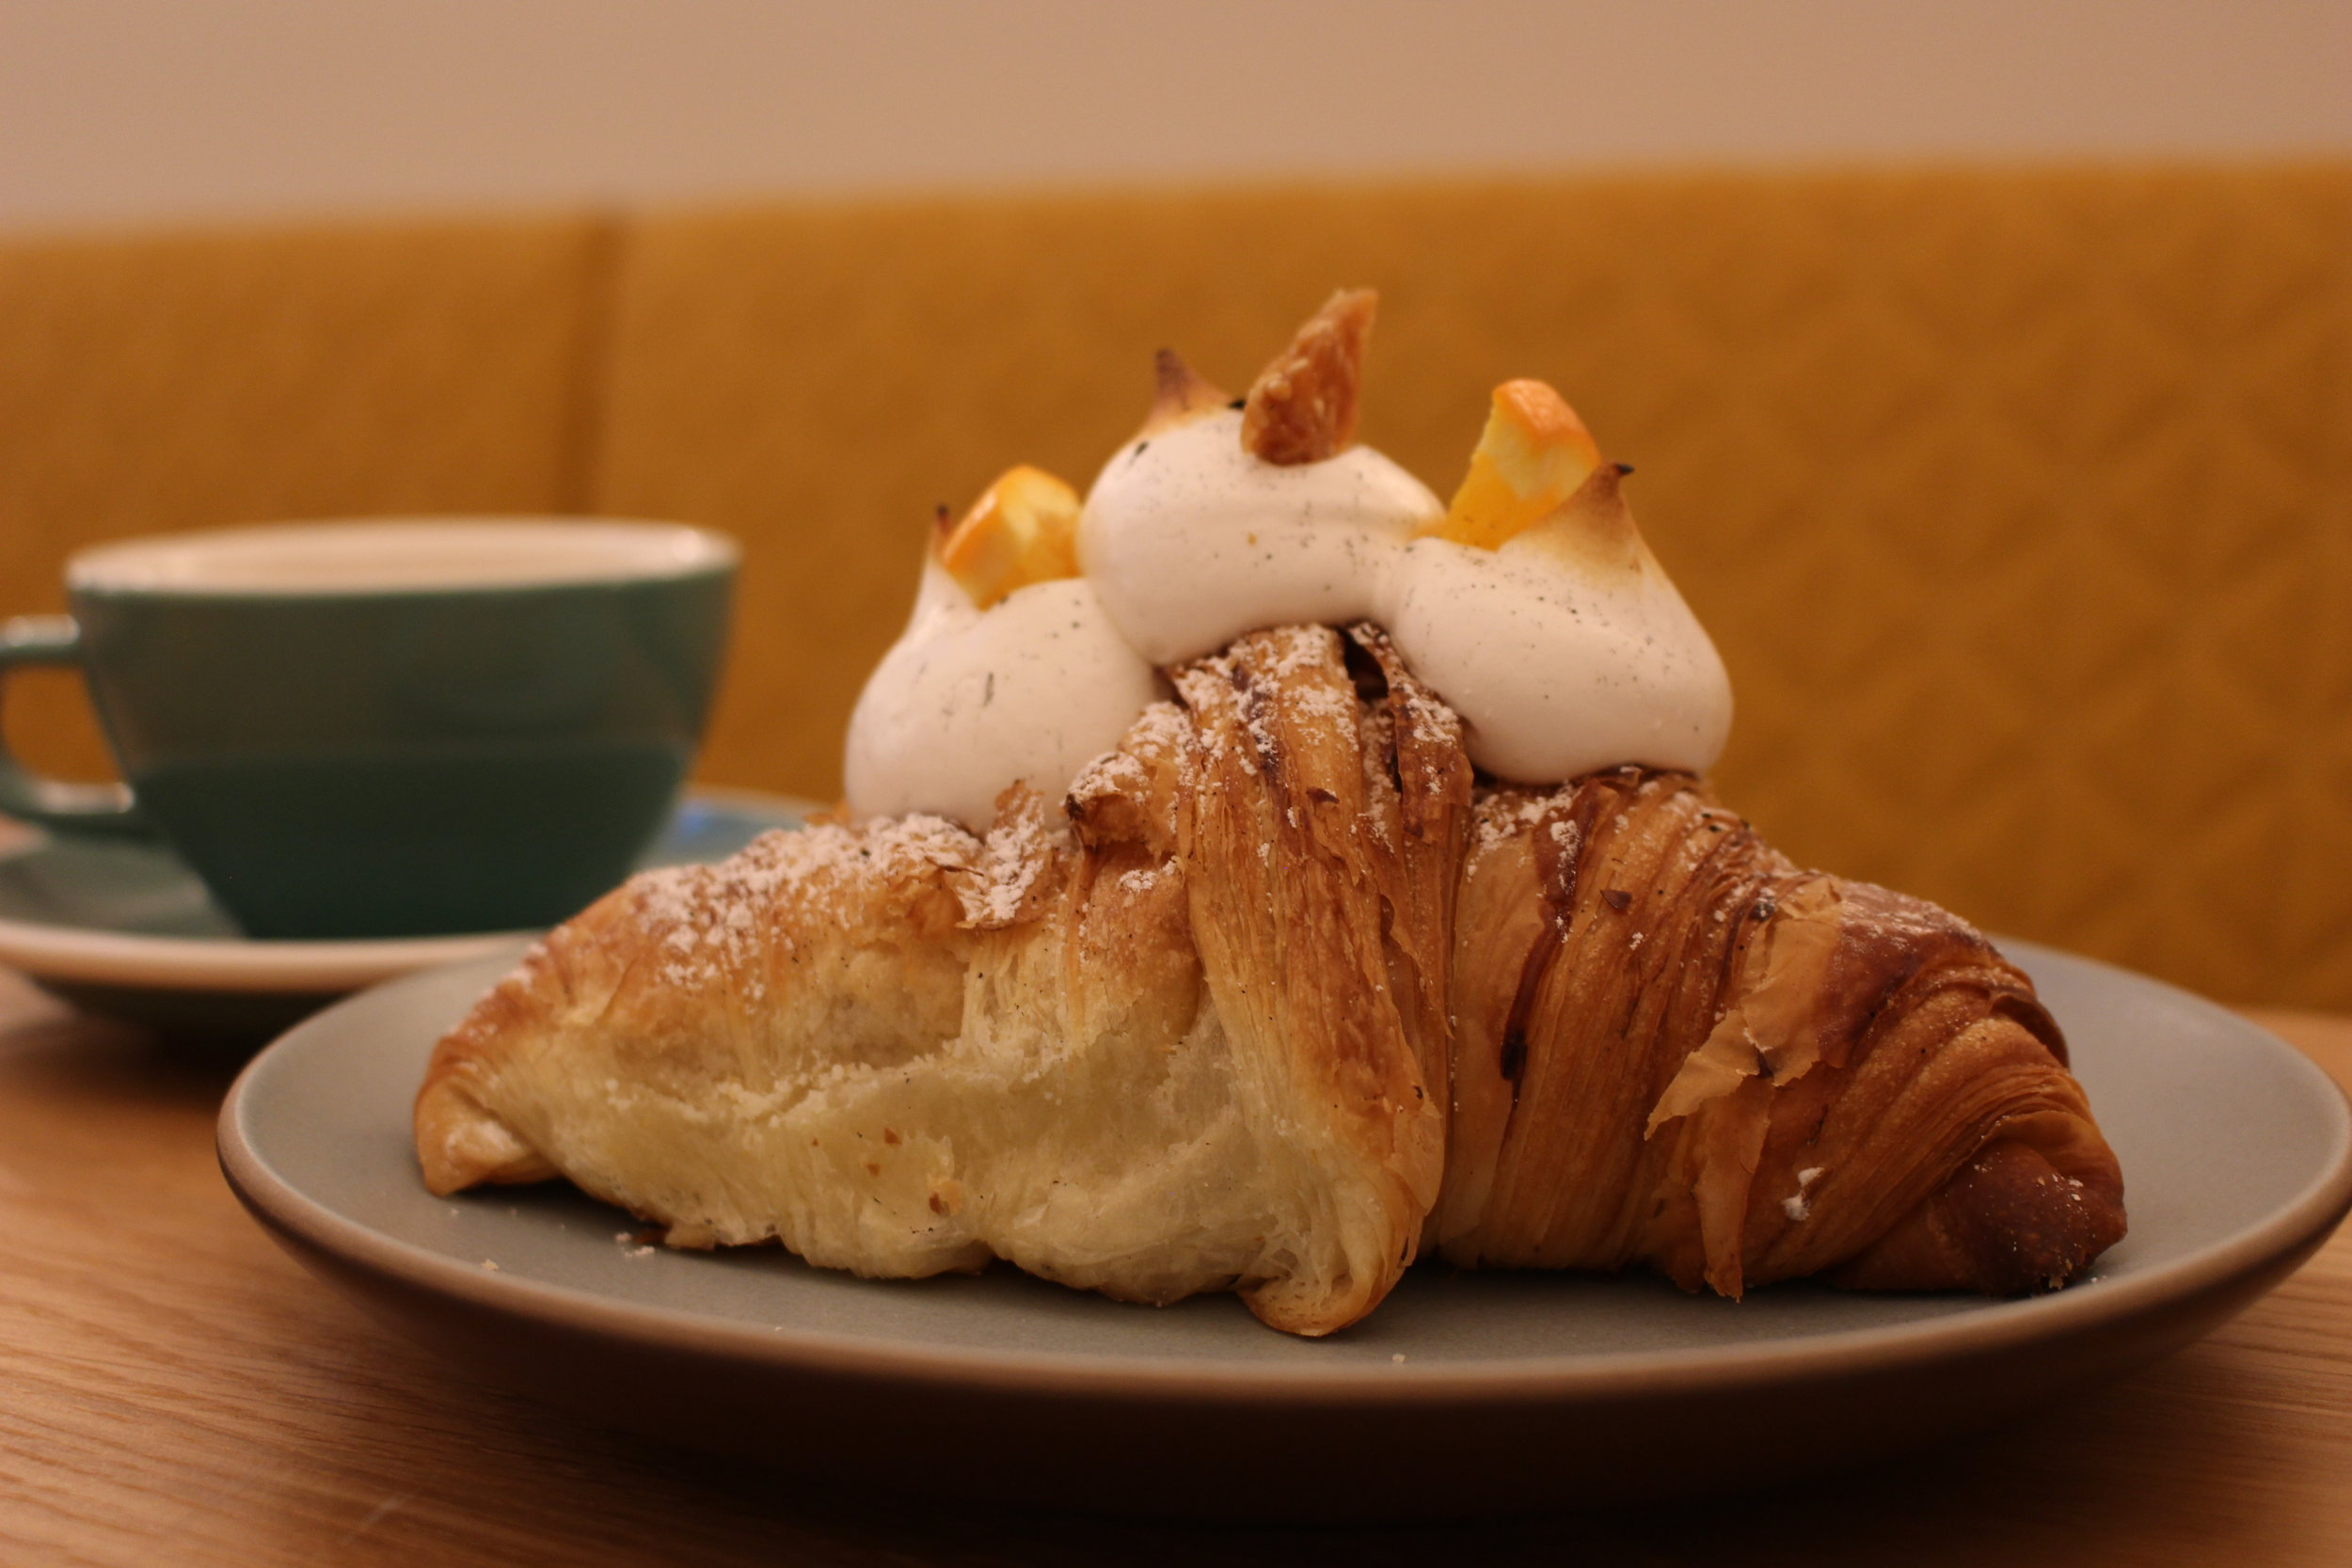 Black sesame croissant with yuzu curd and torched meringue (Photo: Tamara Palmer)